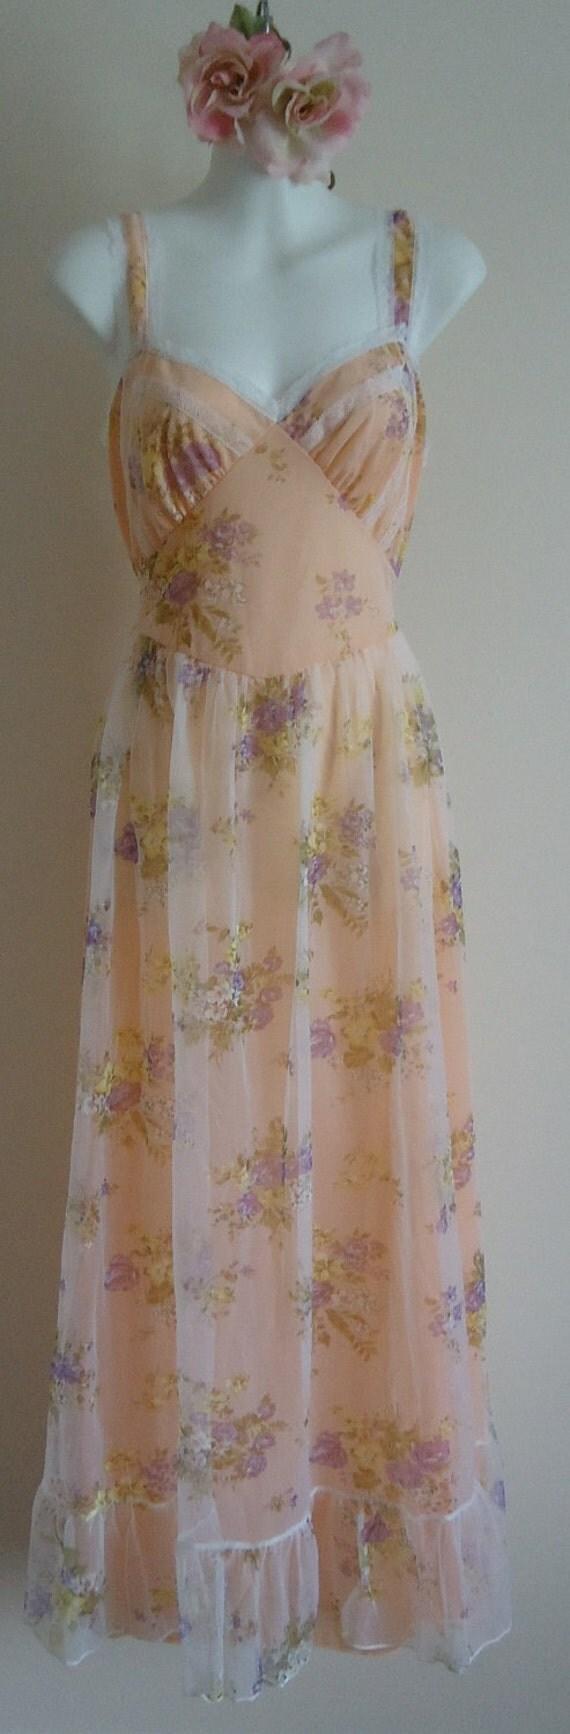 Vintage Nightgown, Vintage Nightgowns, 1950s Nightgown,  White Chiffon Nightgown,  White Floral Nightgown, Nightgown, Wedding, Romantic